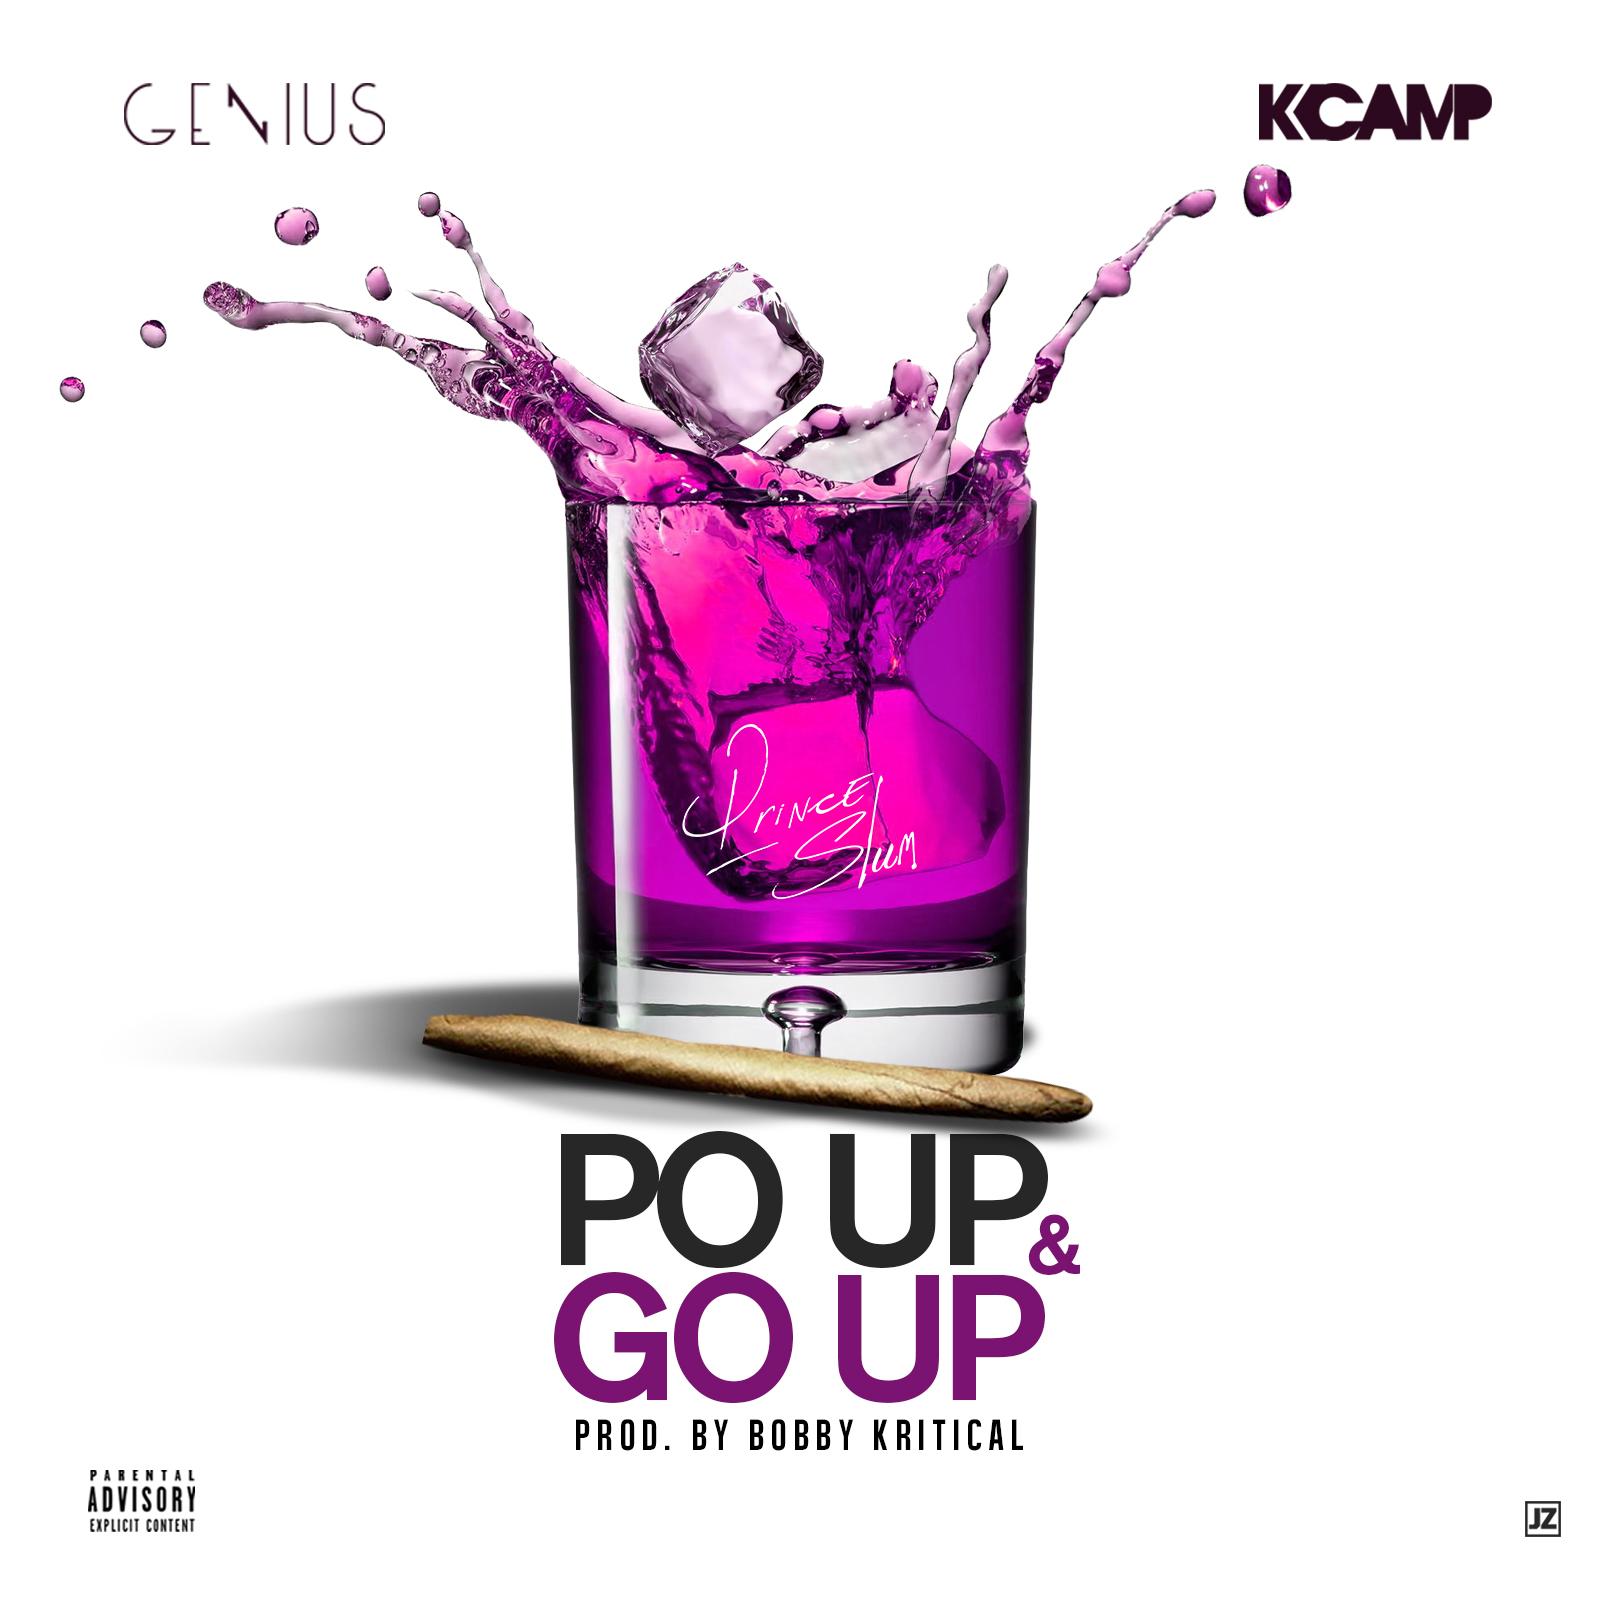 Genius x K Camp - Po Up & Go Up (Artwork)